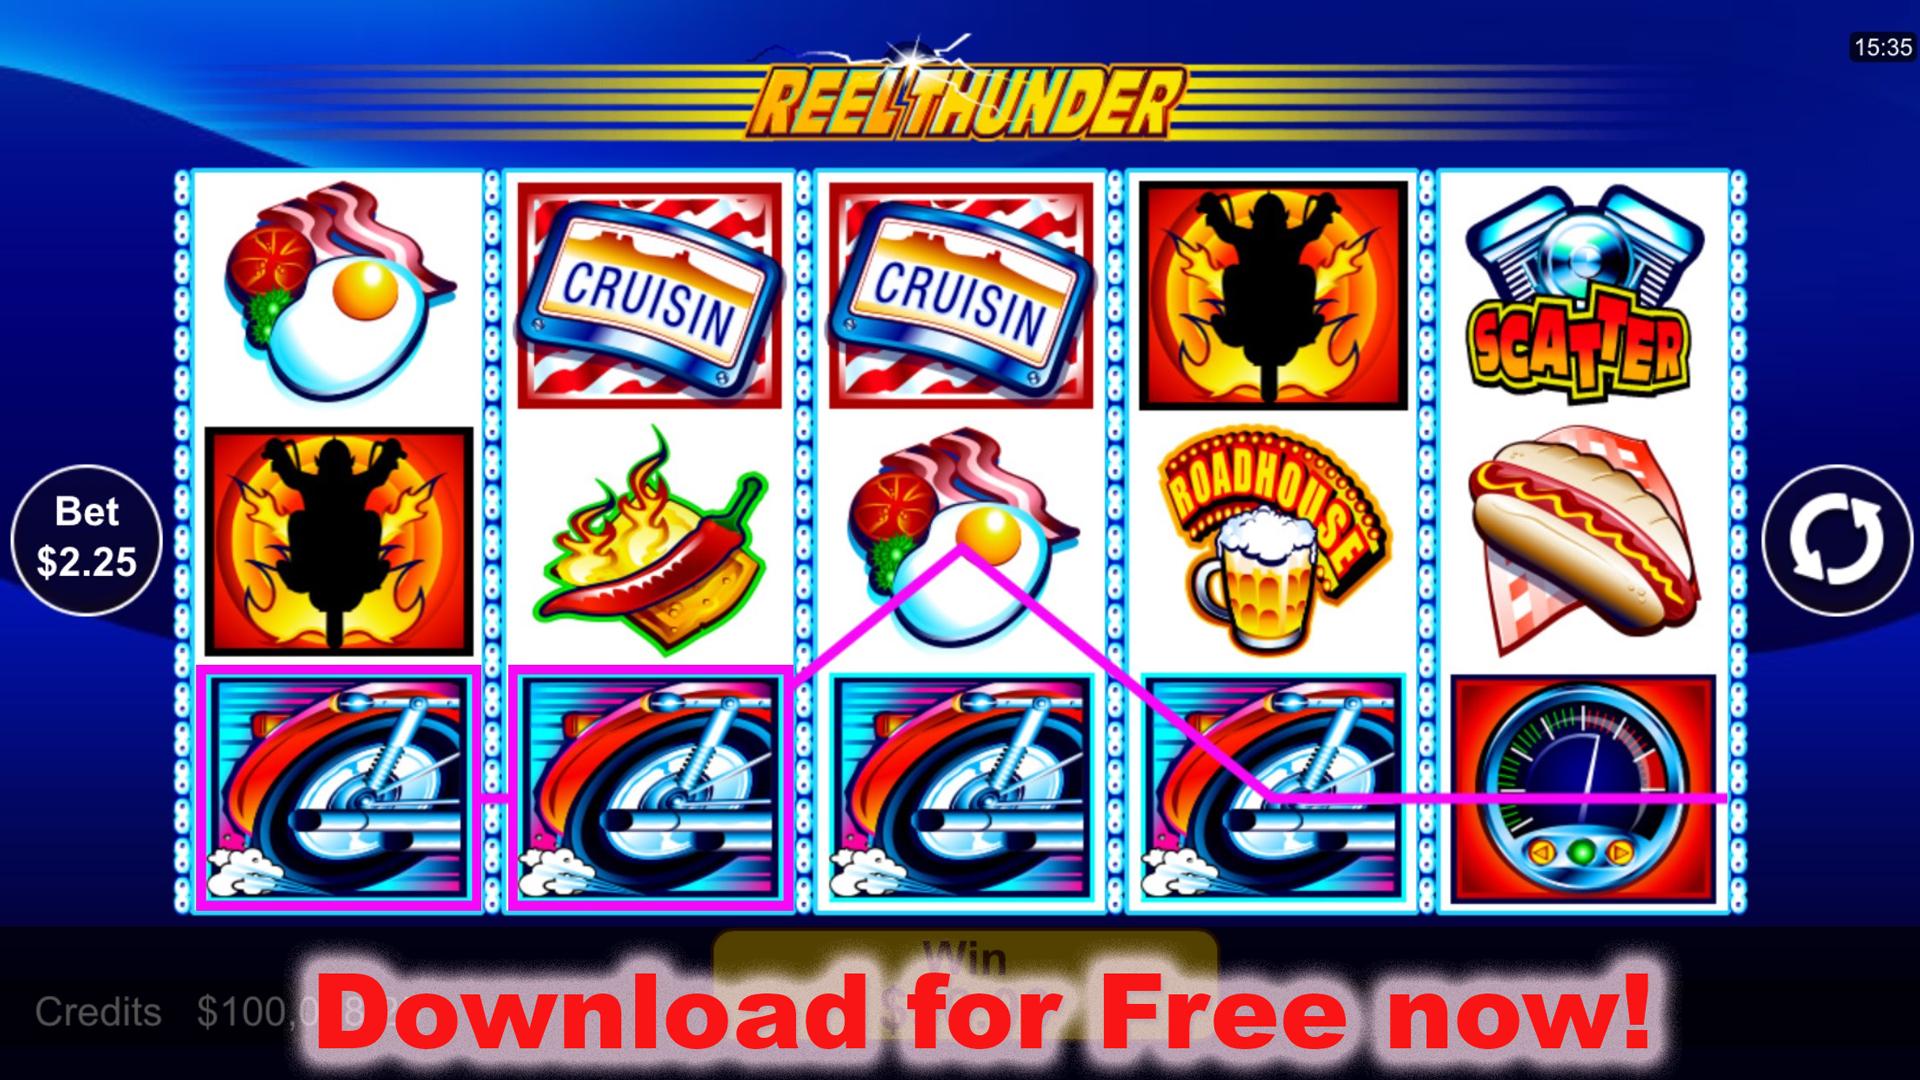 Dakota thunder free slots